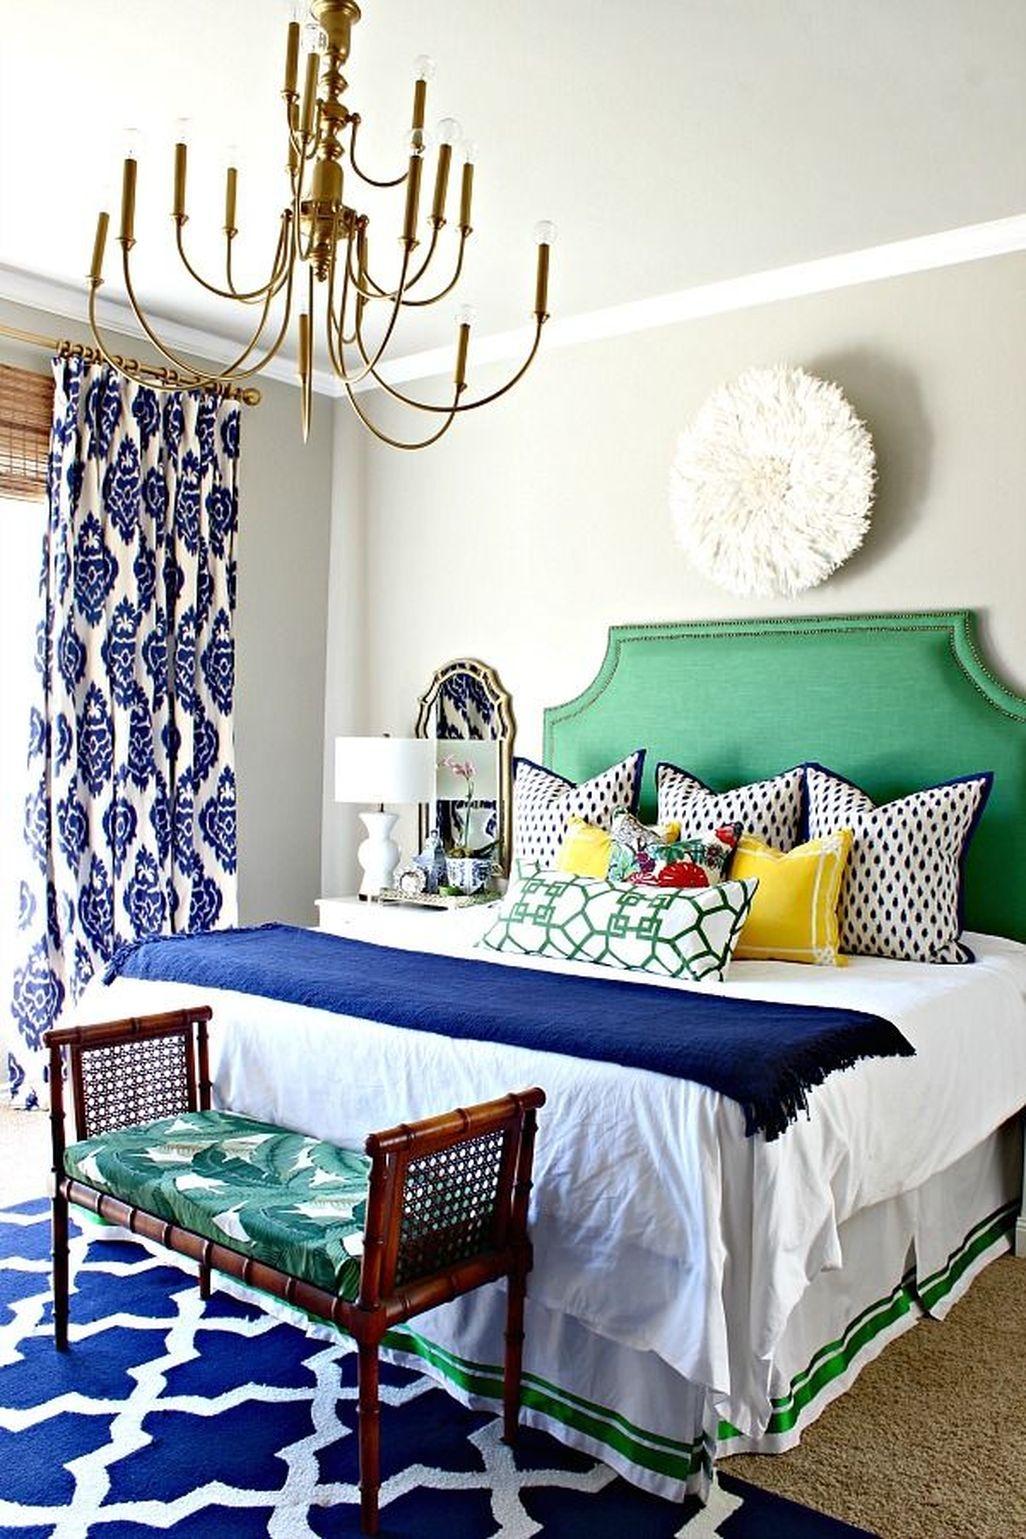 Easy Diy Spring And Summer Home Decor Ideas 33